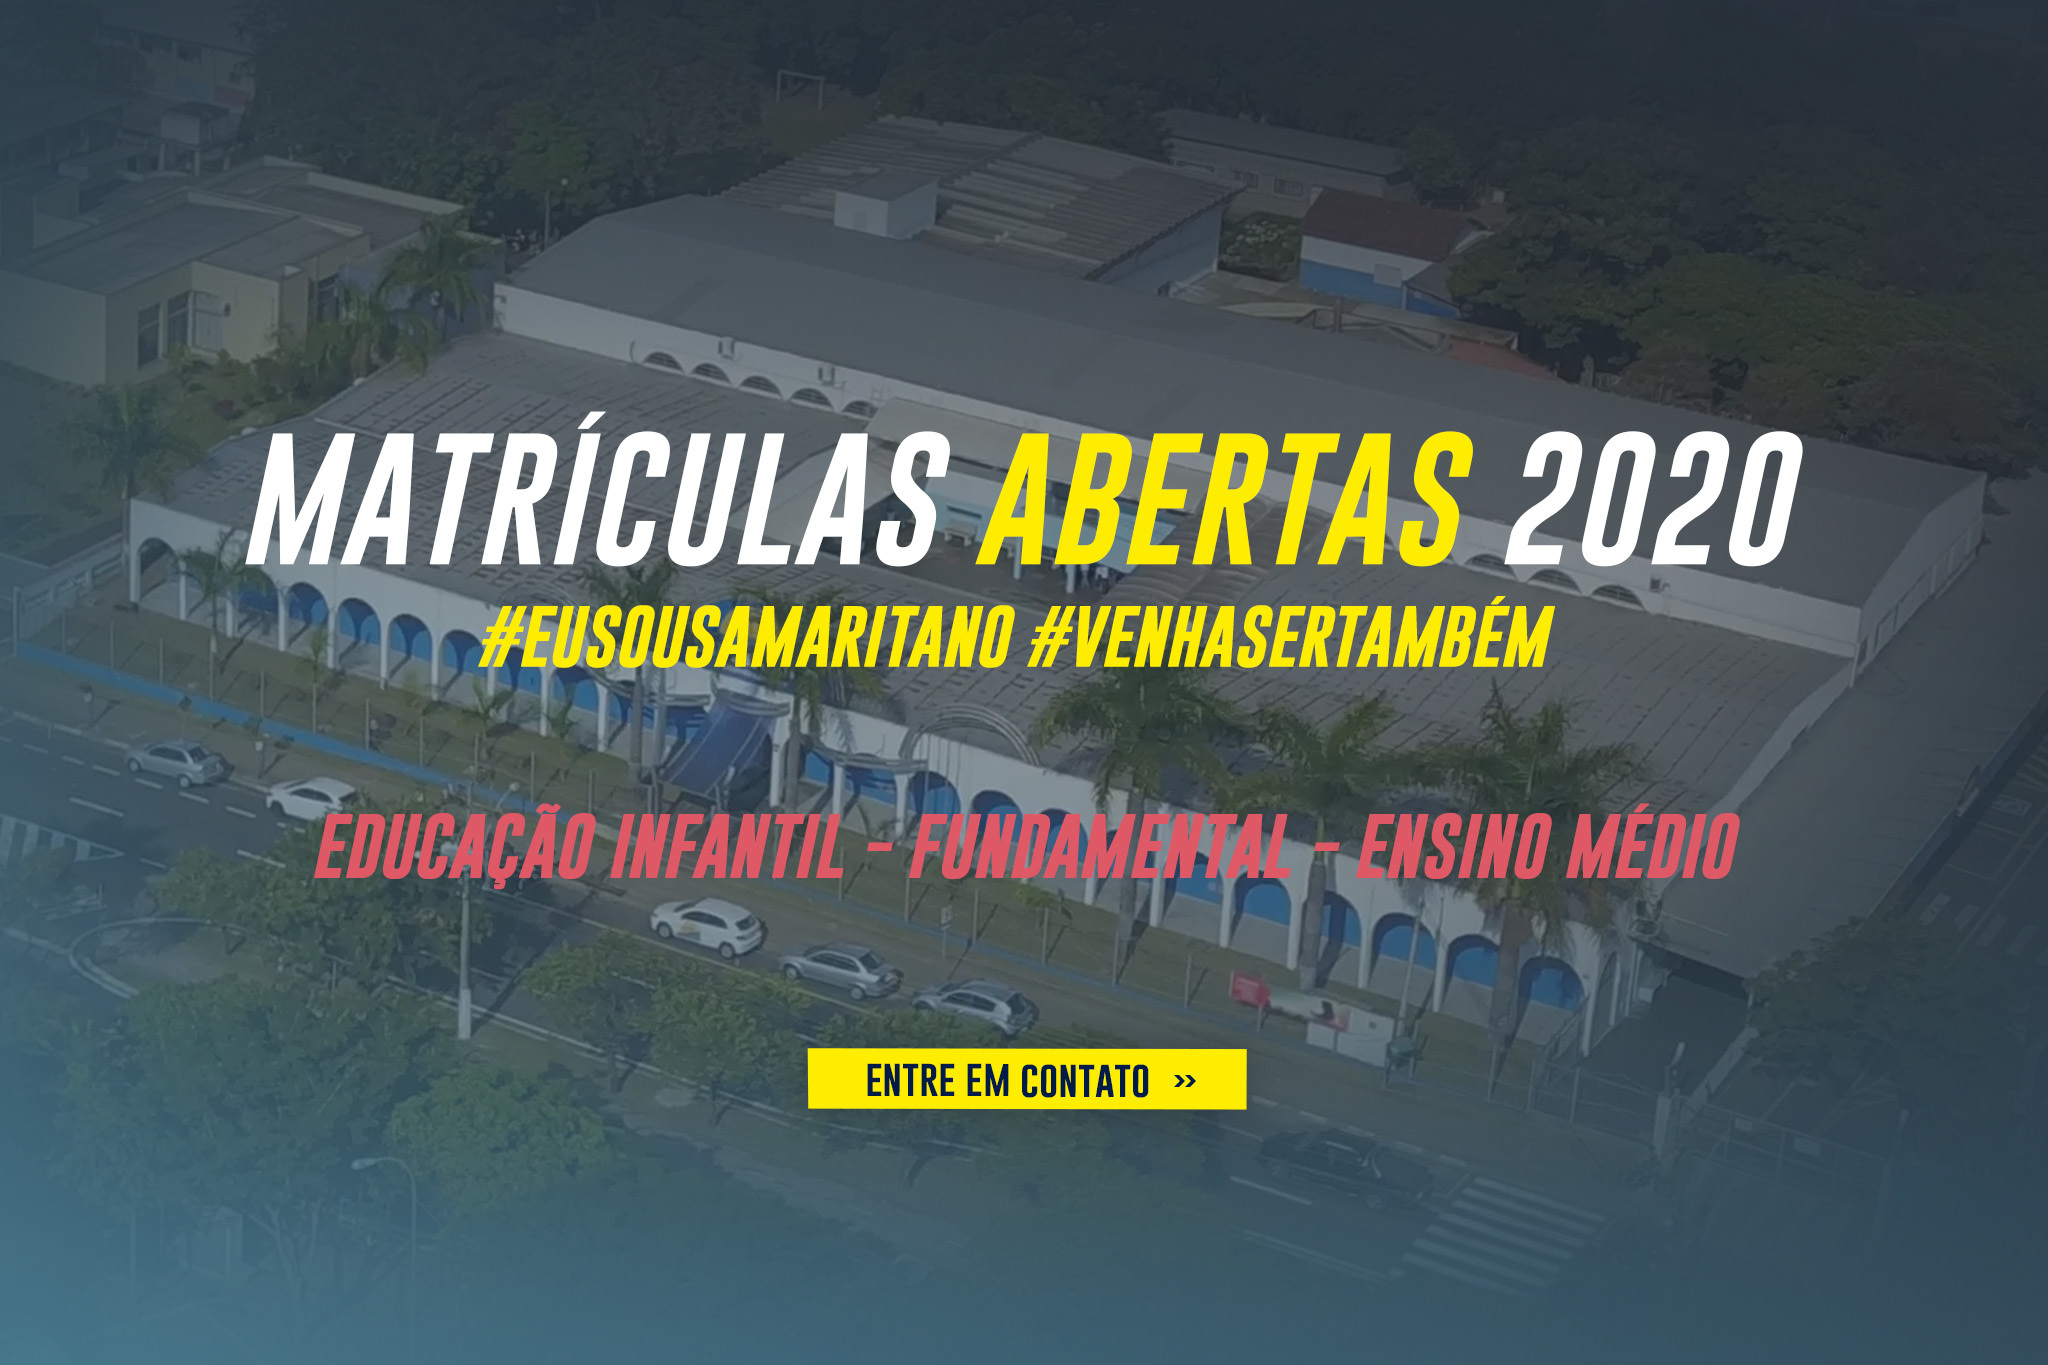 Contate www.institutosamaritano.com.br